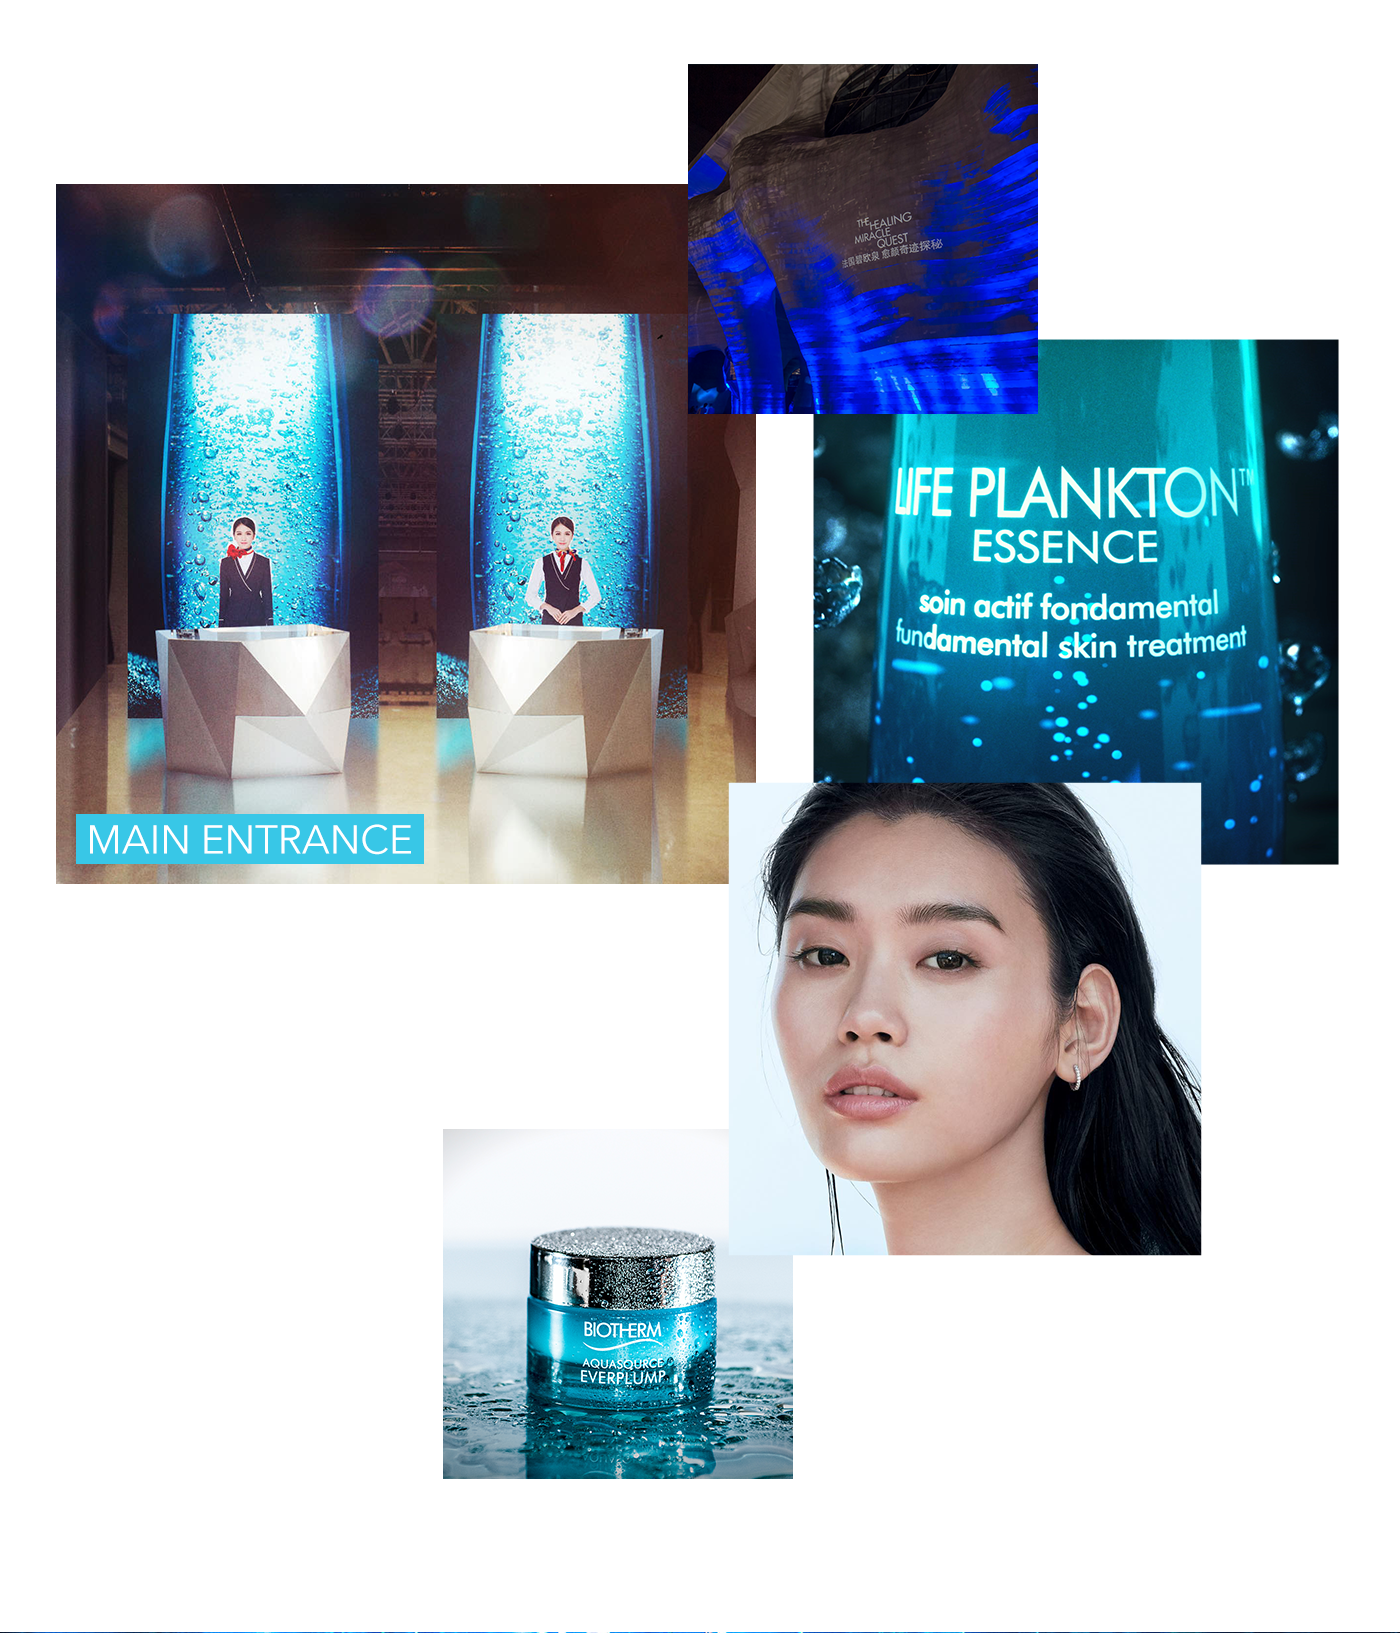 Biotherm Event life plankton brand branding  skincare Exhibition